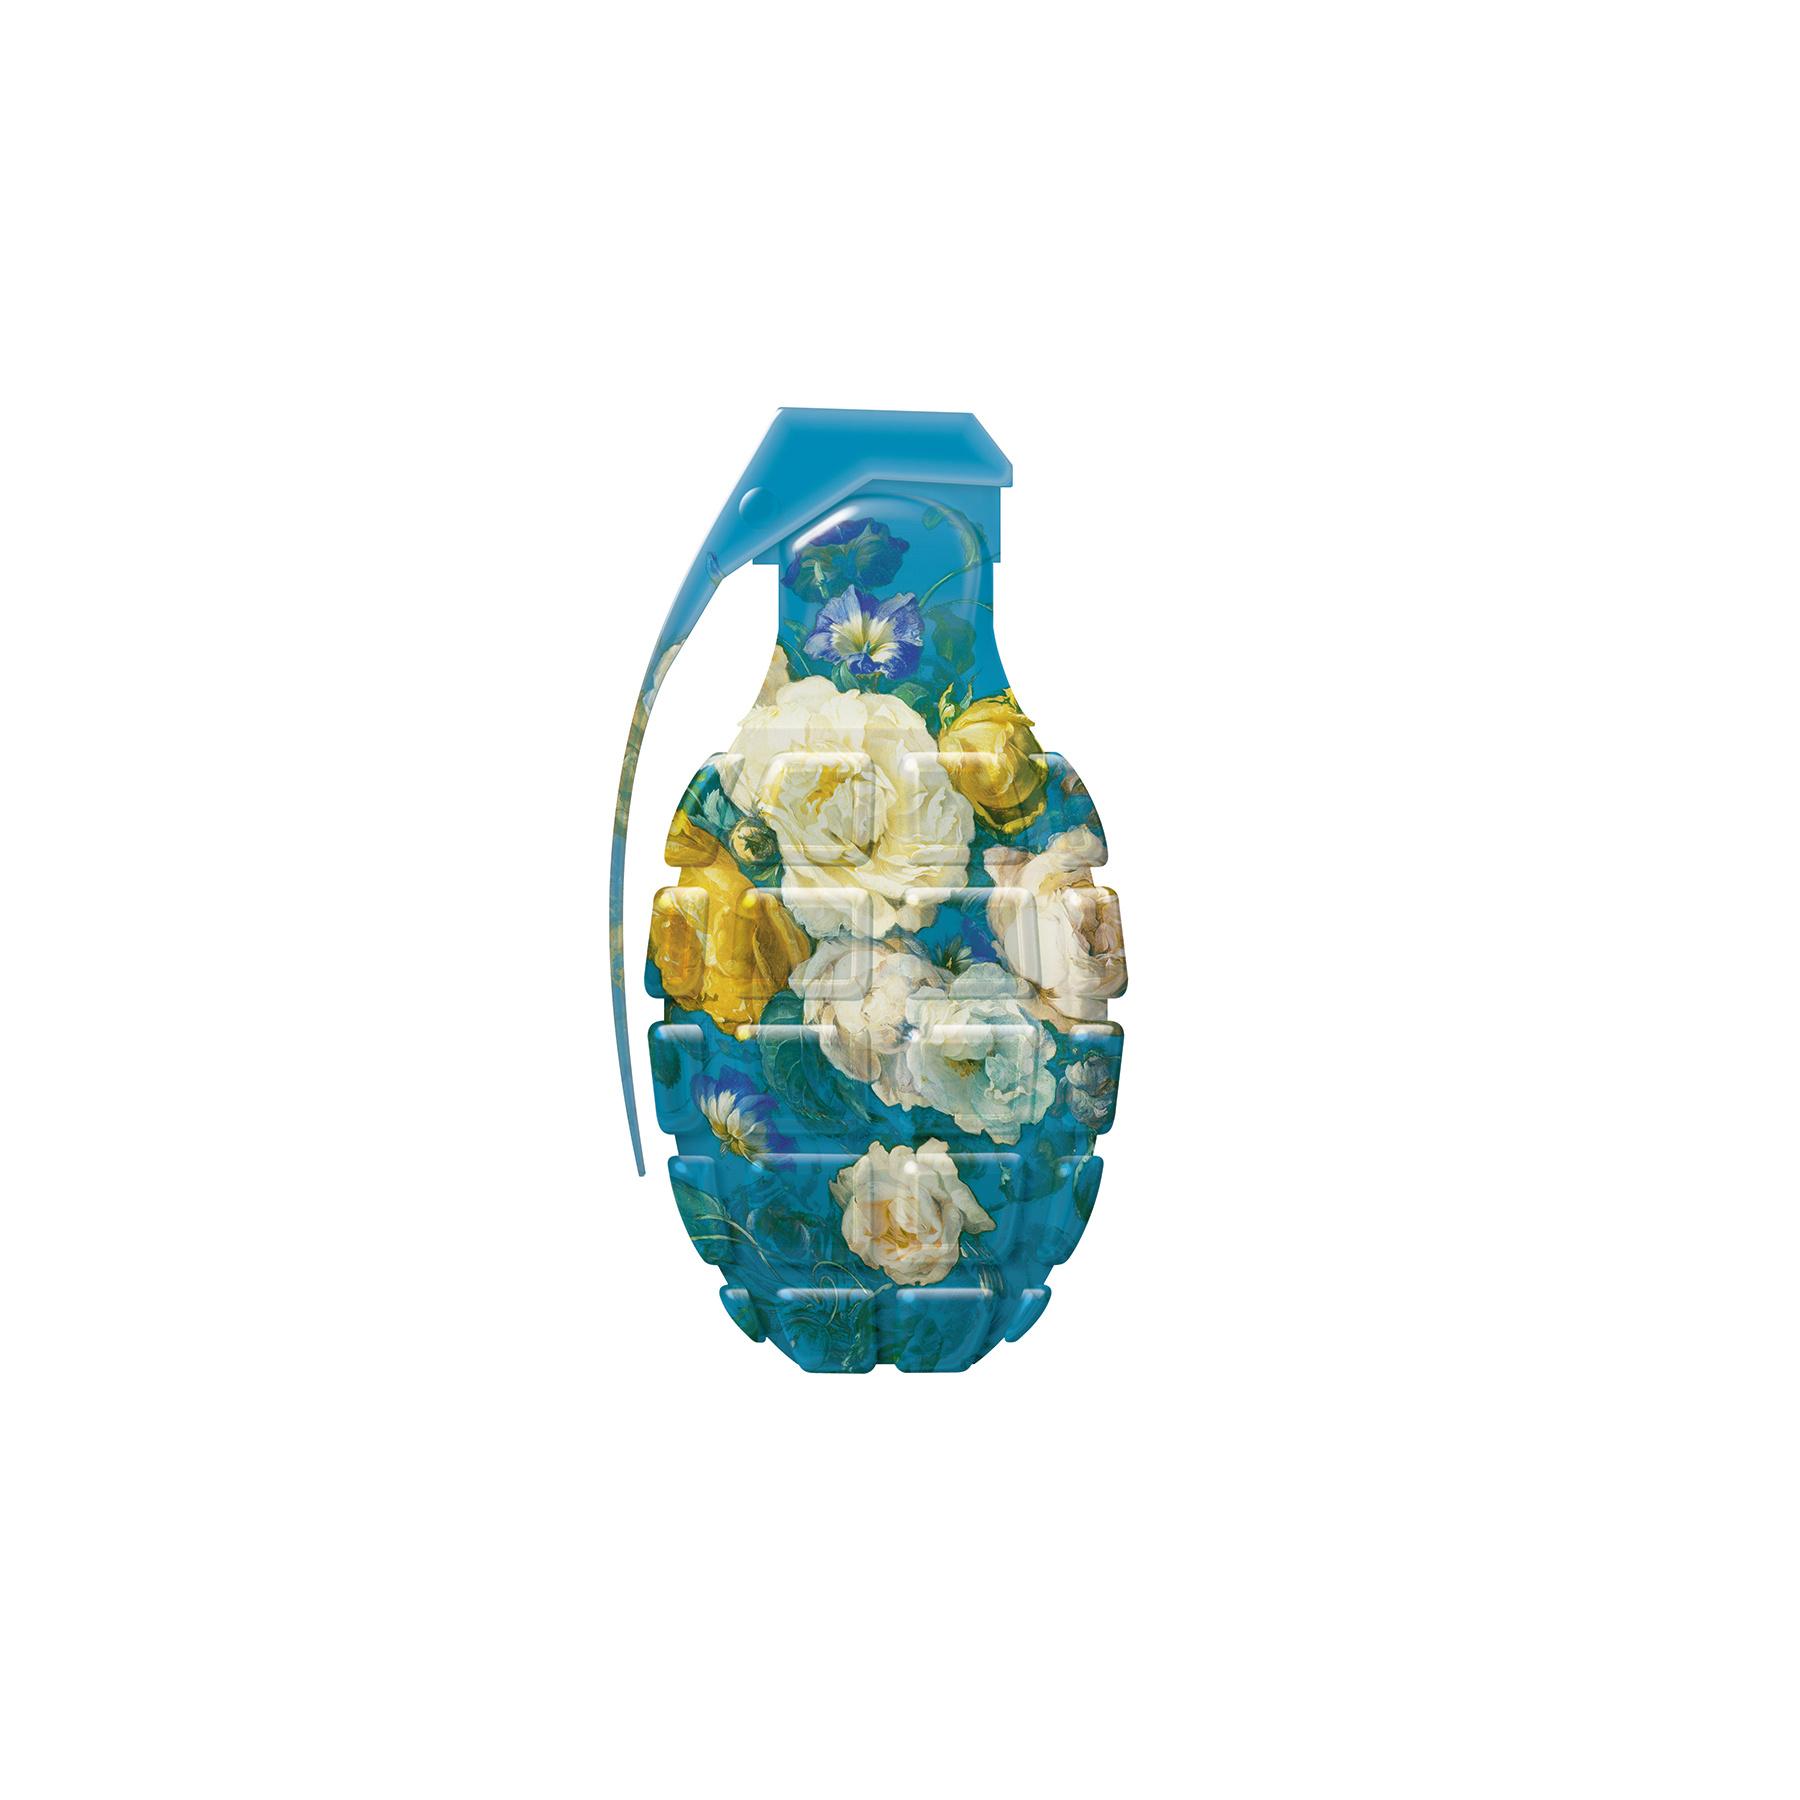 Visual Artwork: Flower Grenade by artist and creator Magnus Gjoen